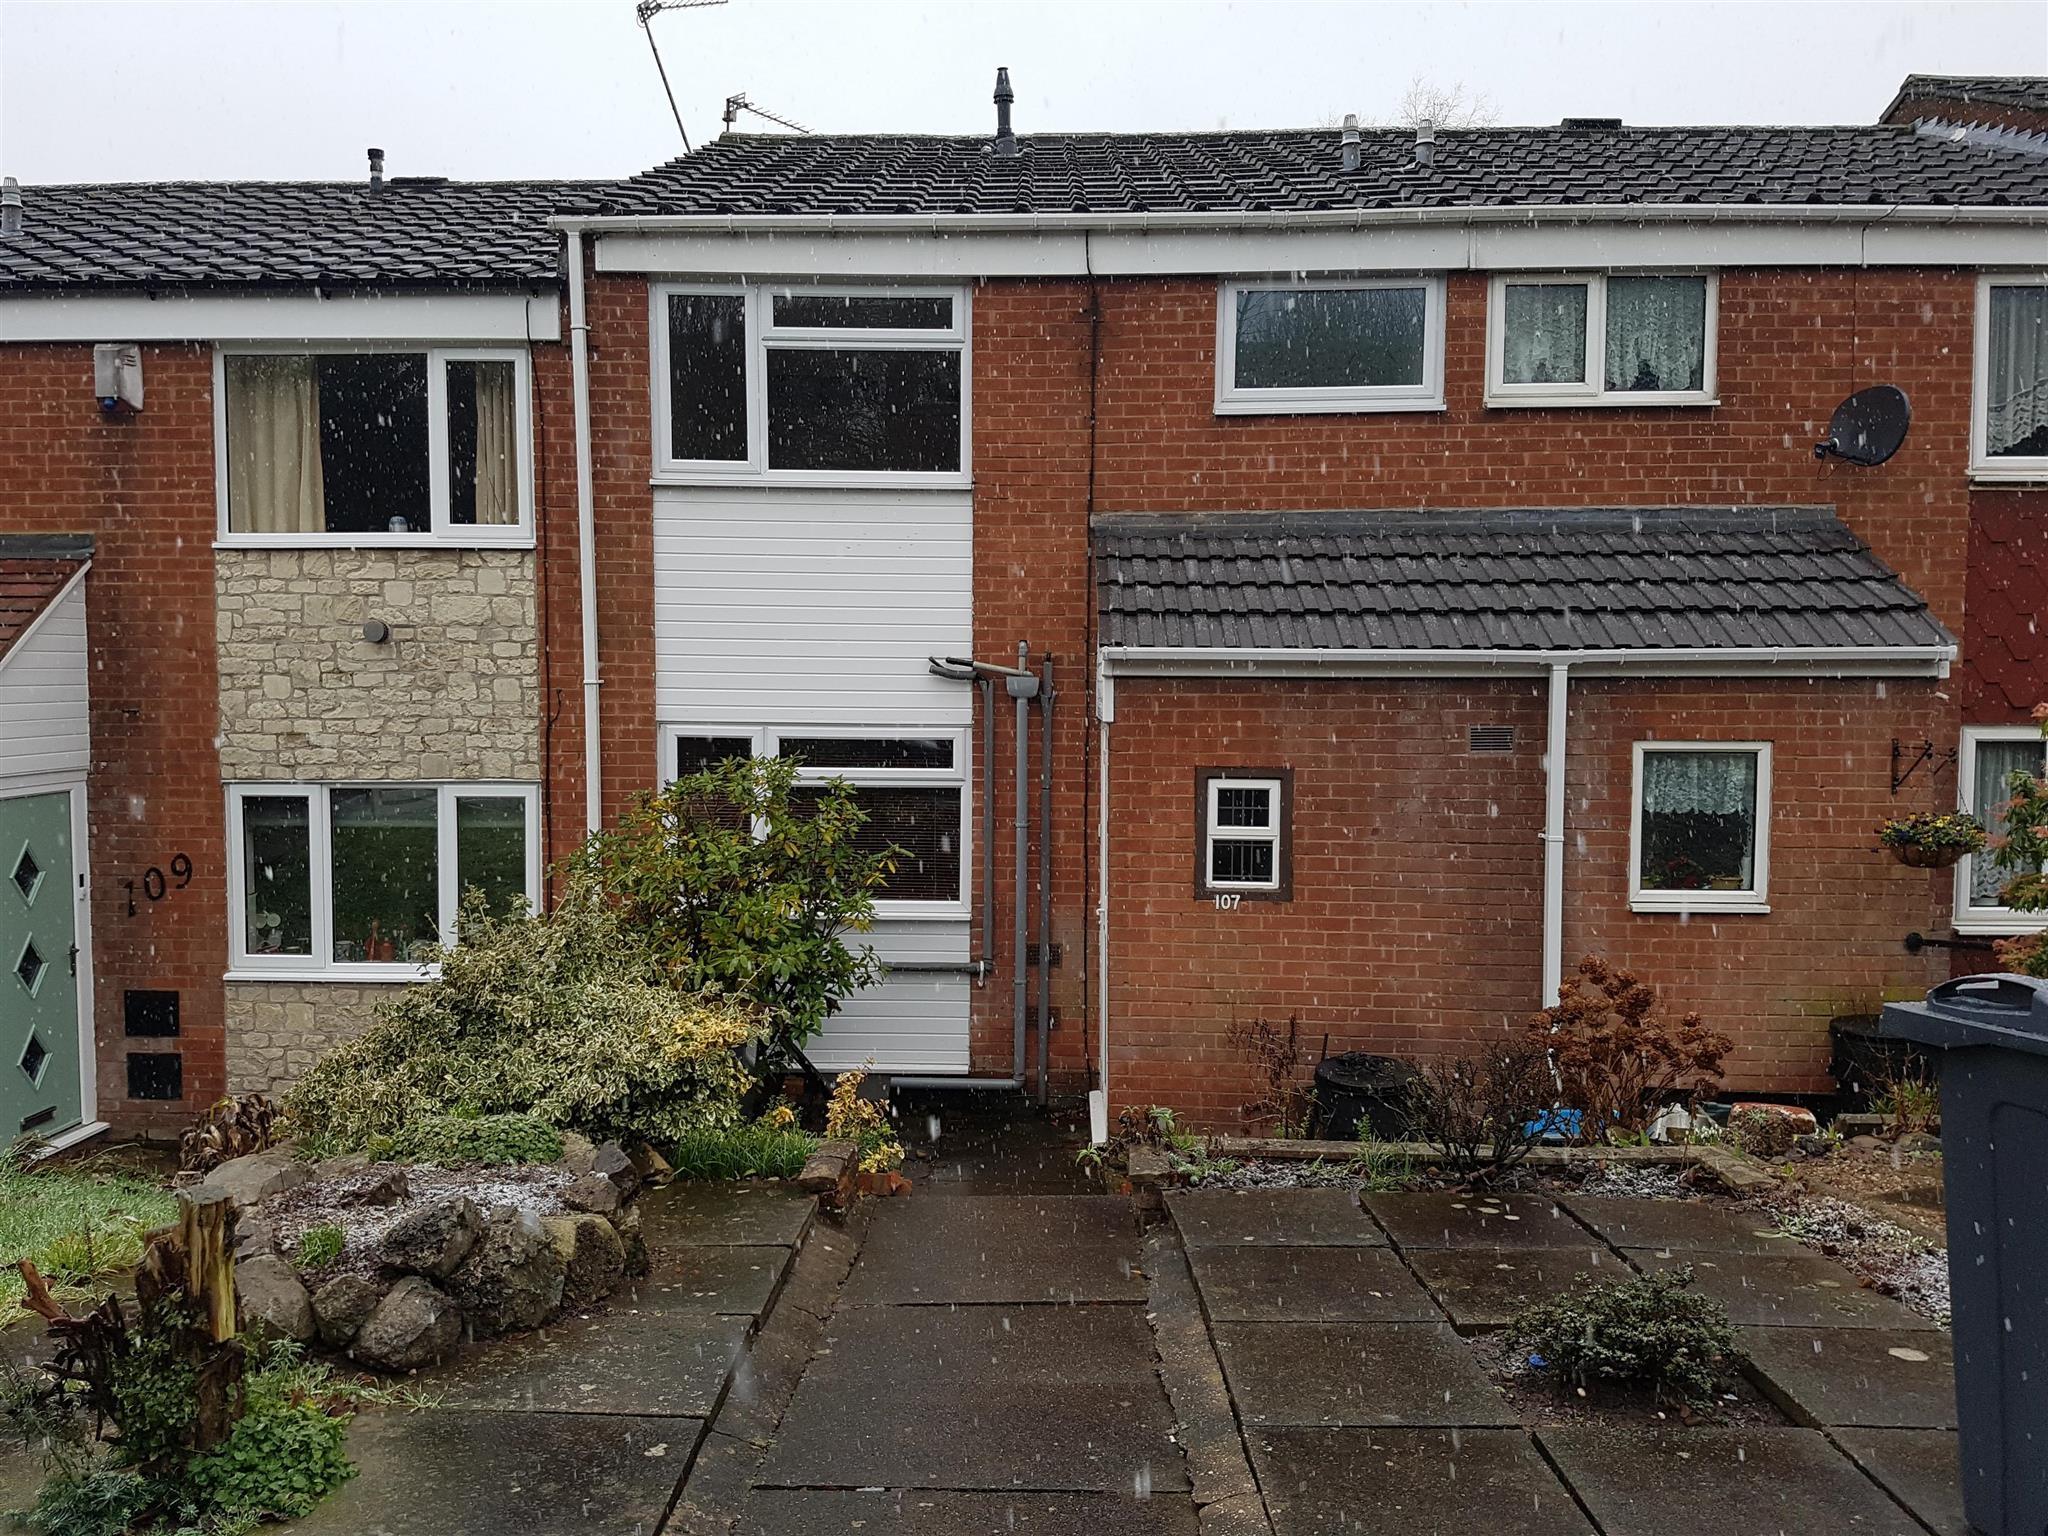 3 Bedroom Houses For Rent In Birmingham Dss 28 Images Martin Co Birmingham Kings Heath 3